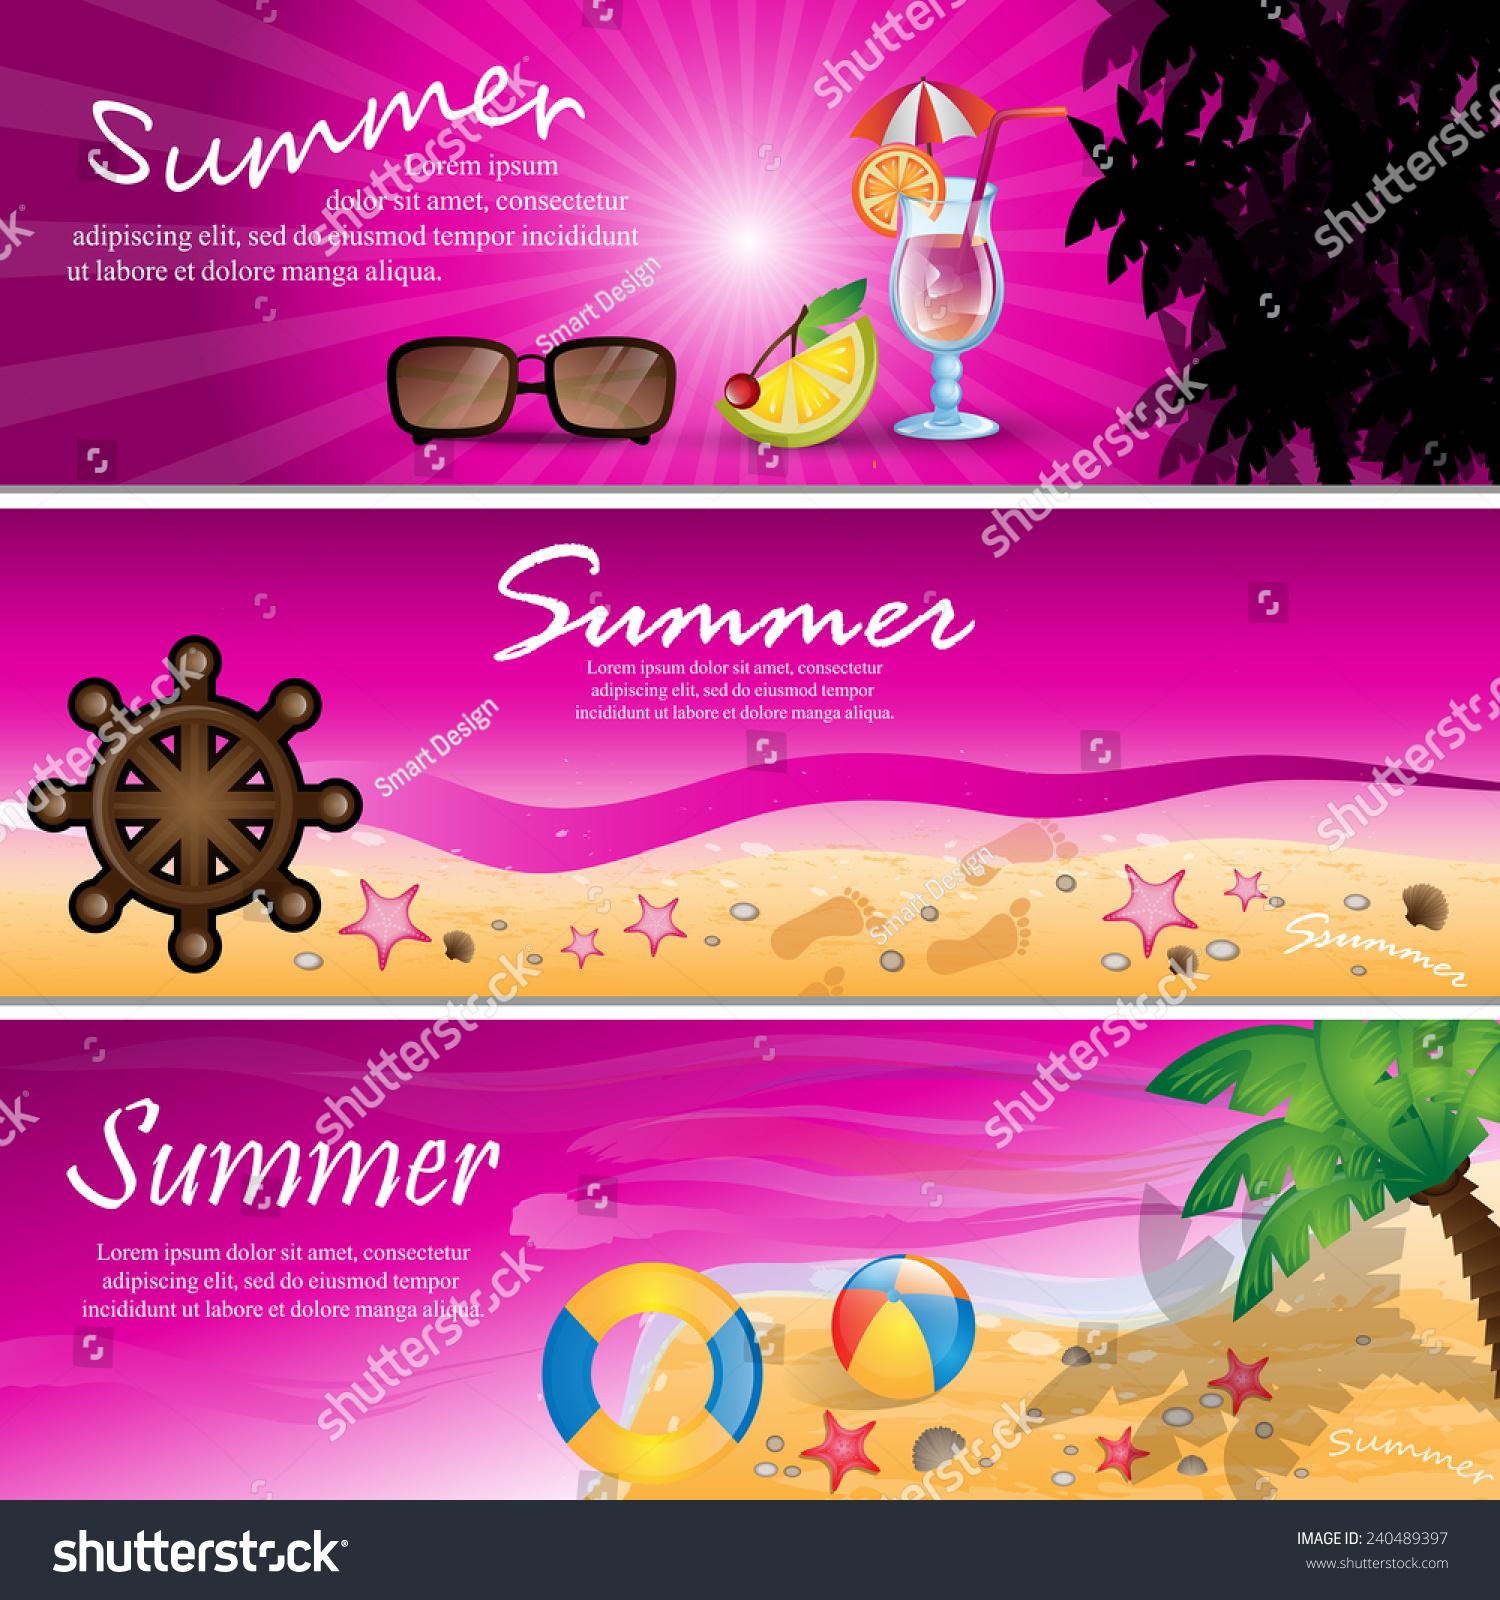 Summer Flyer Template Stock Illustration Image 49302930 ìu2014¬ë¦u201e Stock Vector  Summer